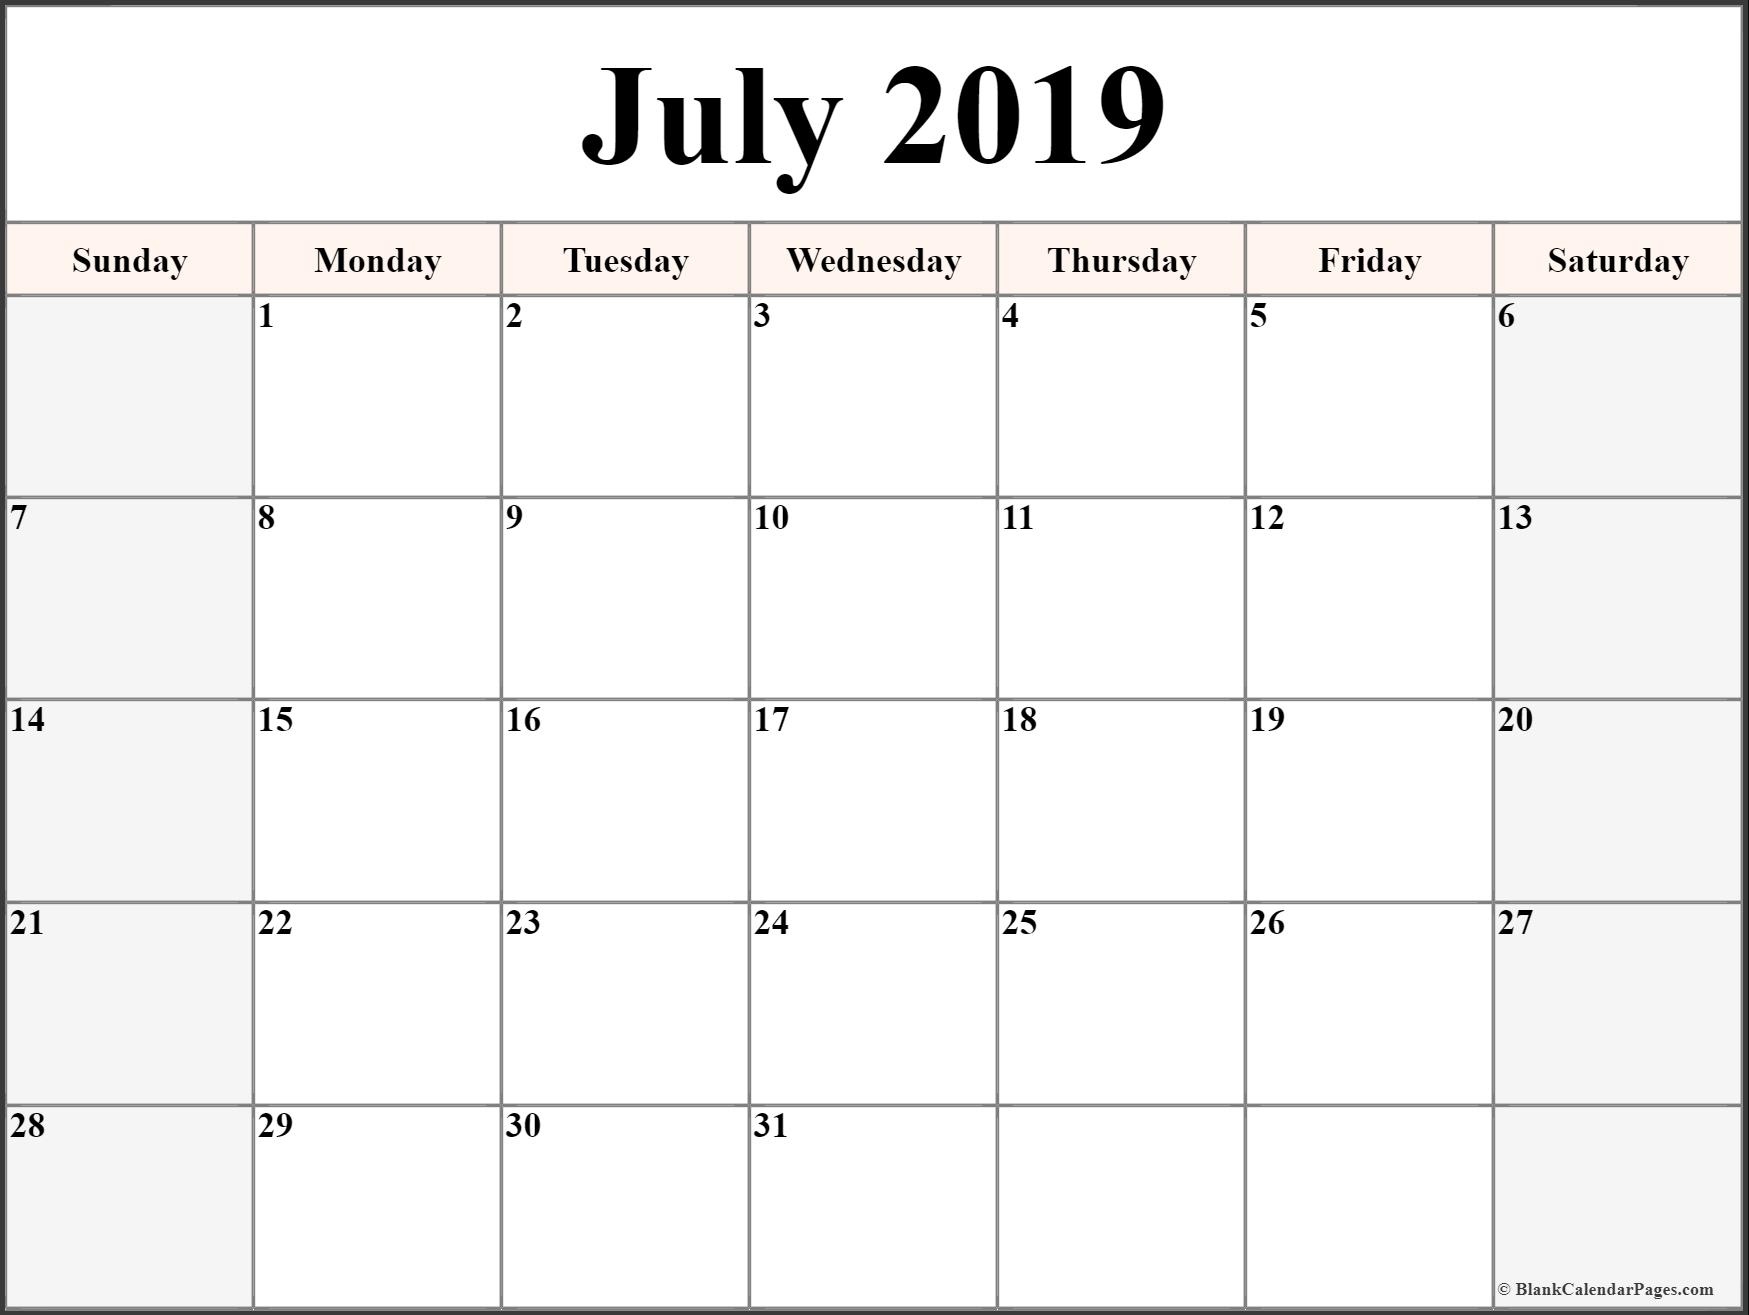 July 2019 Calendar Printable Templates | Site Provides Calendar Calendar Of 2019 July